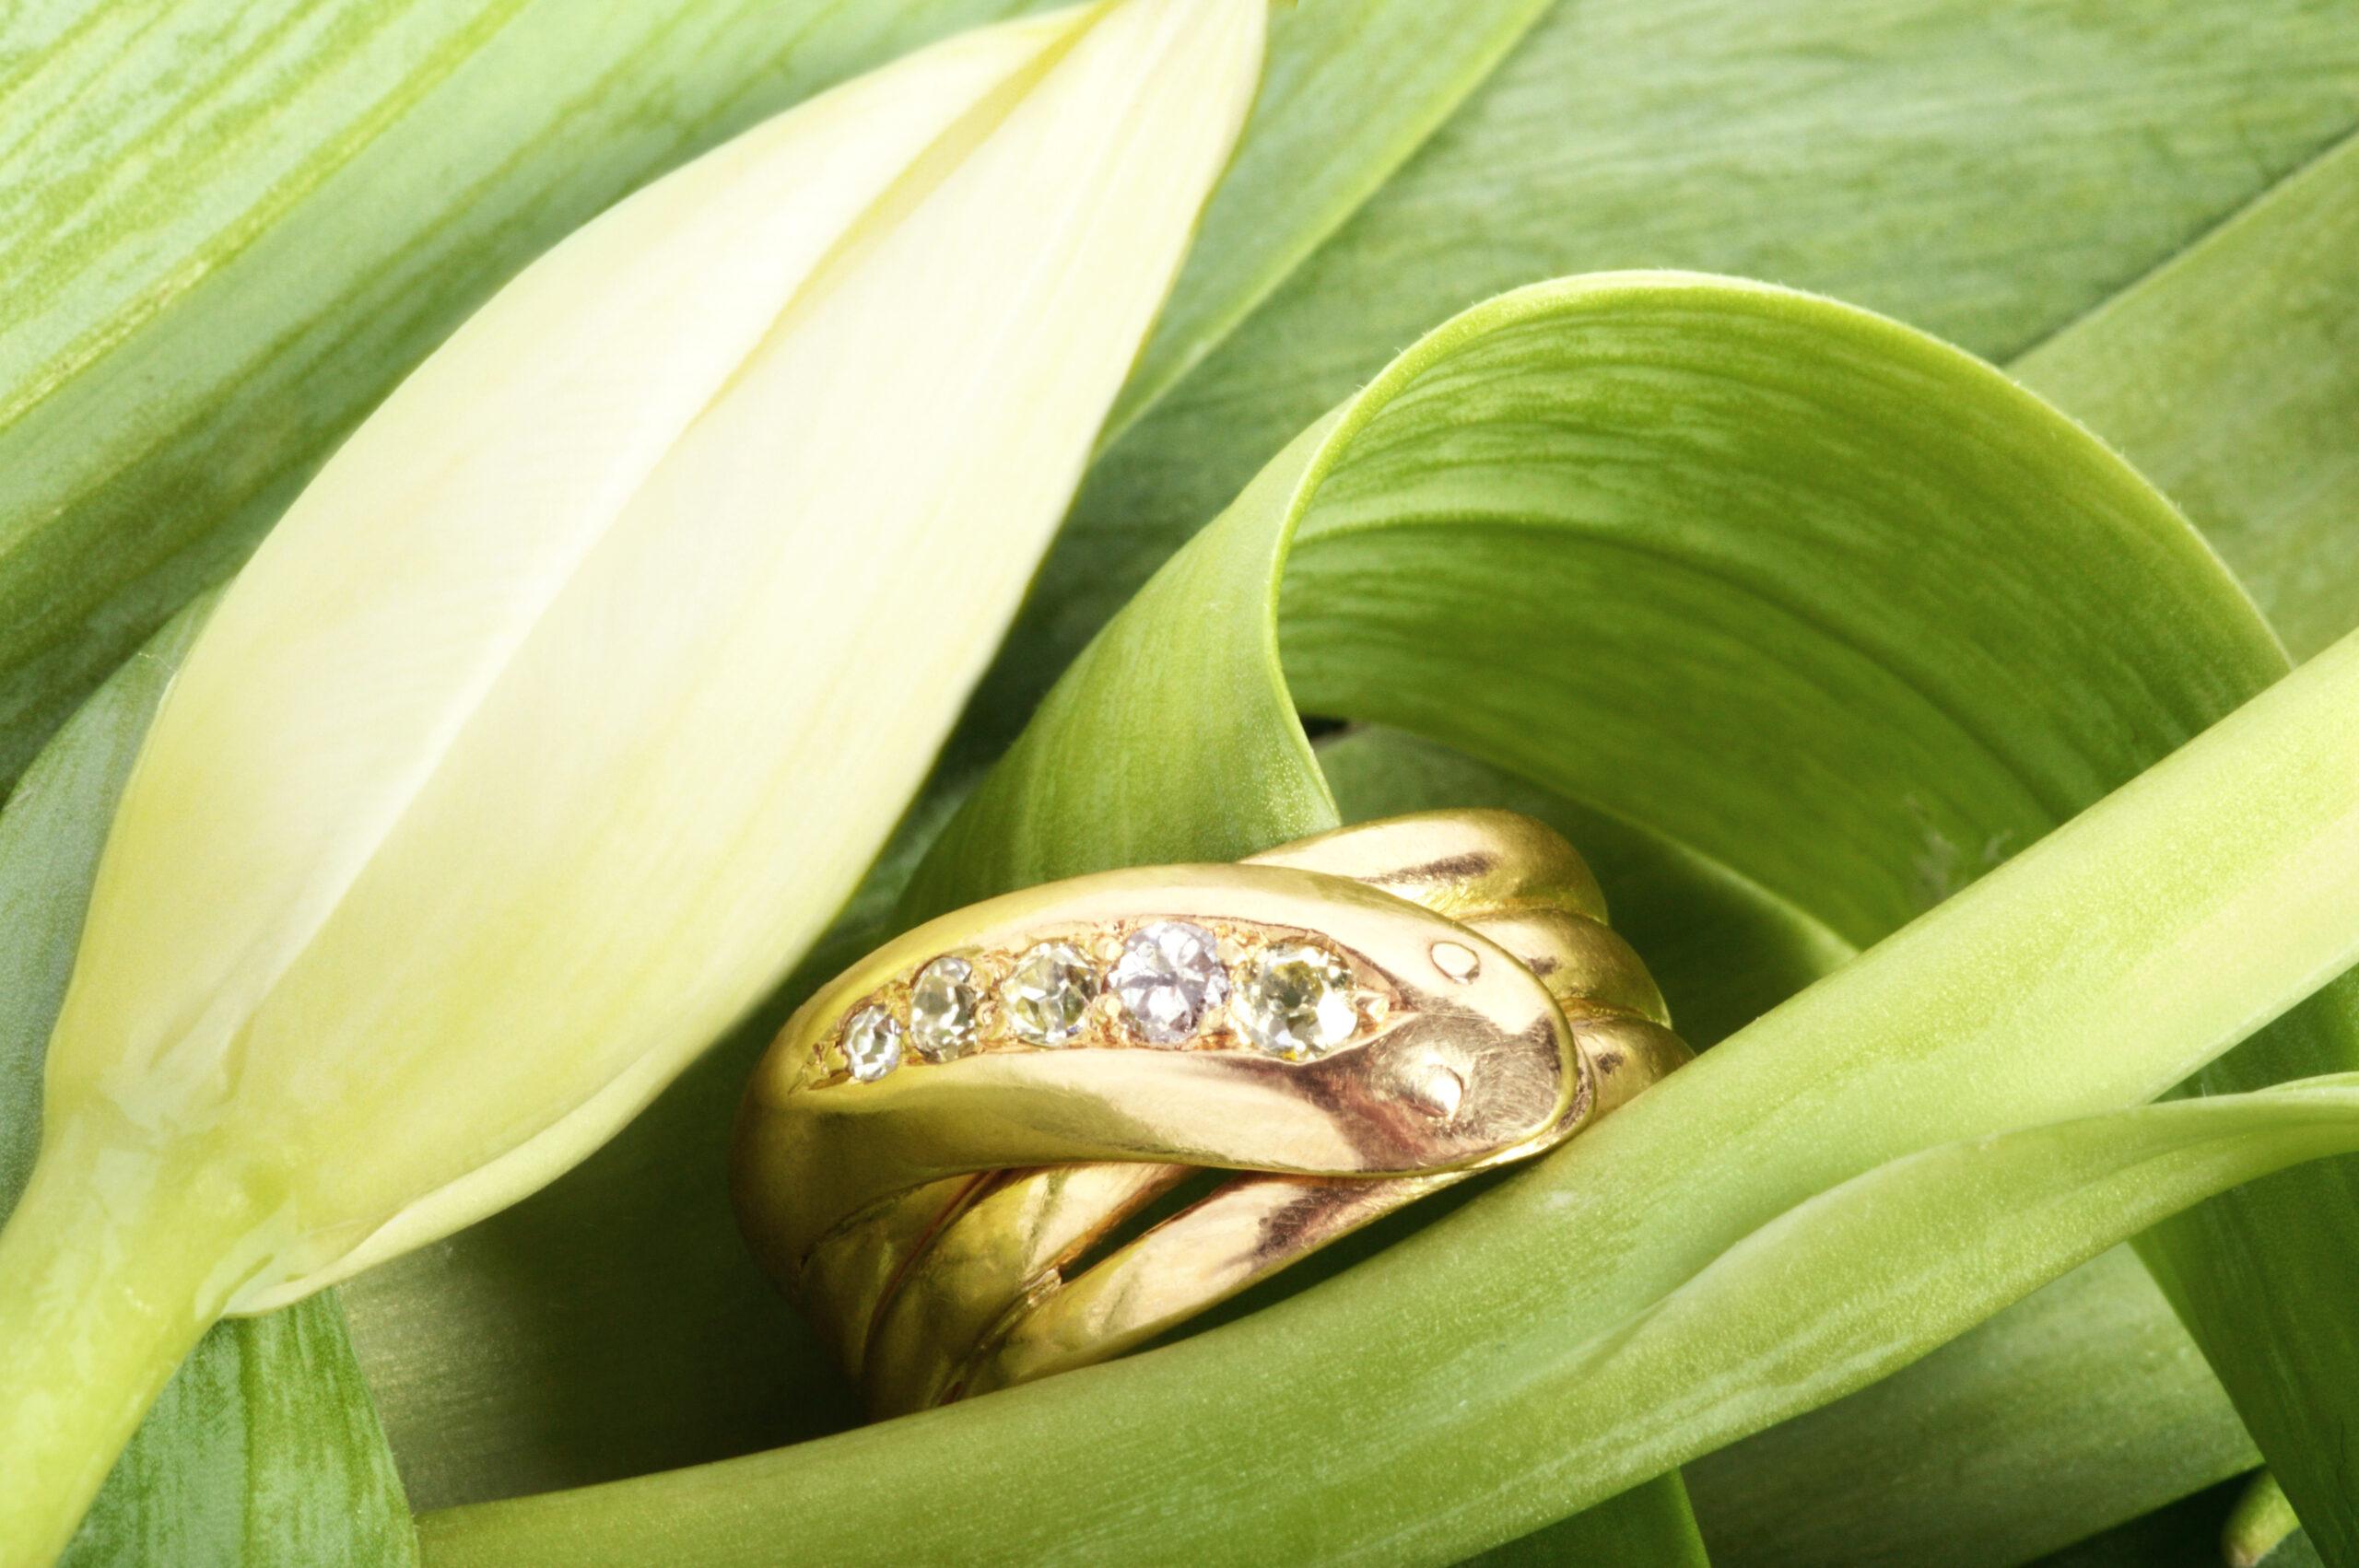 serpent rings in tulip petals